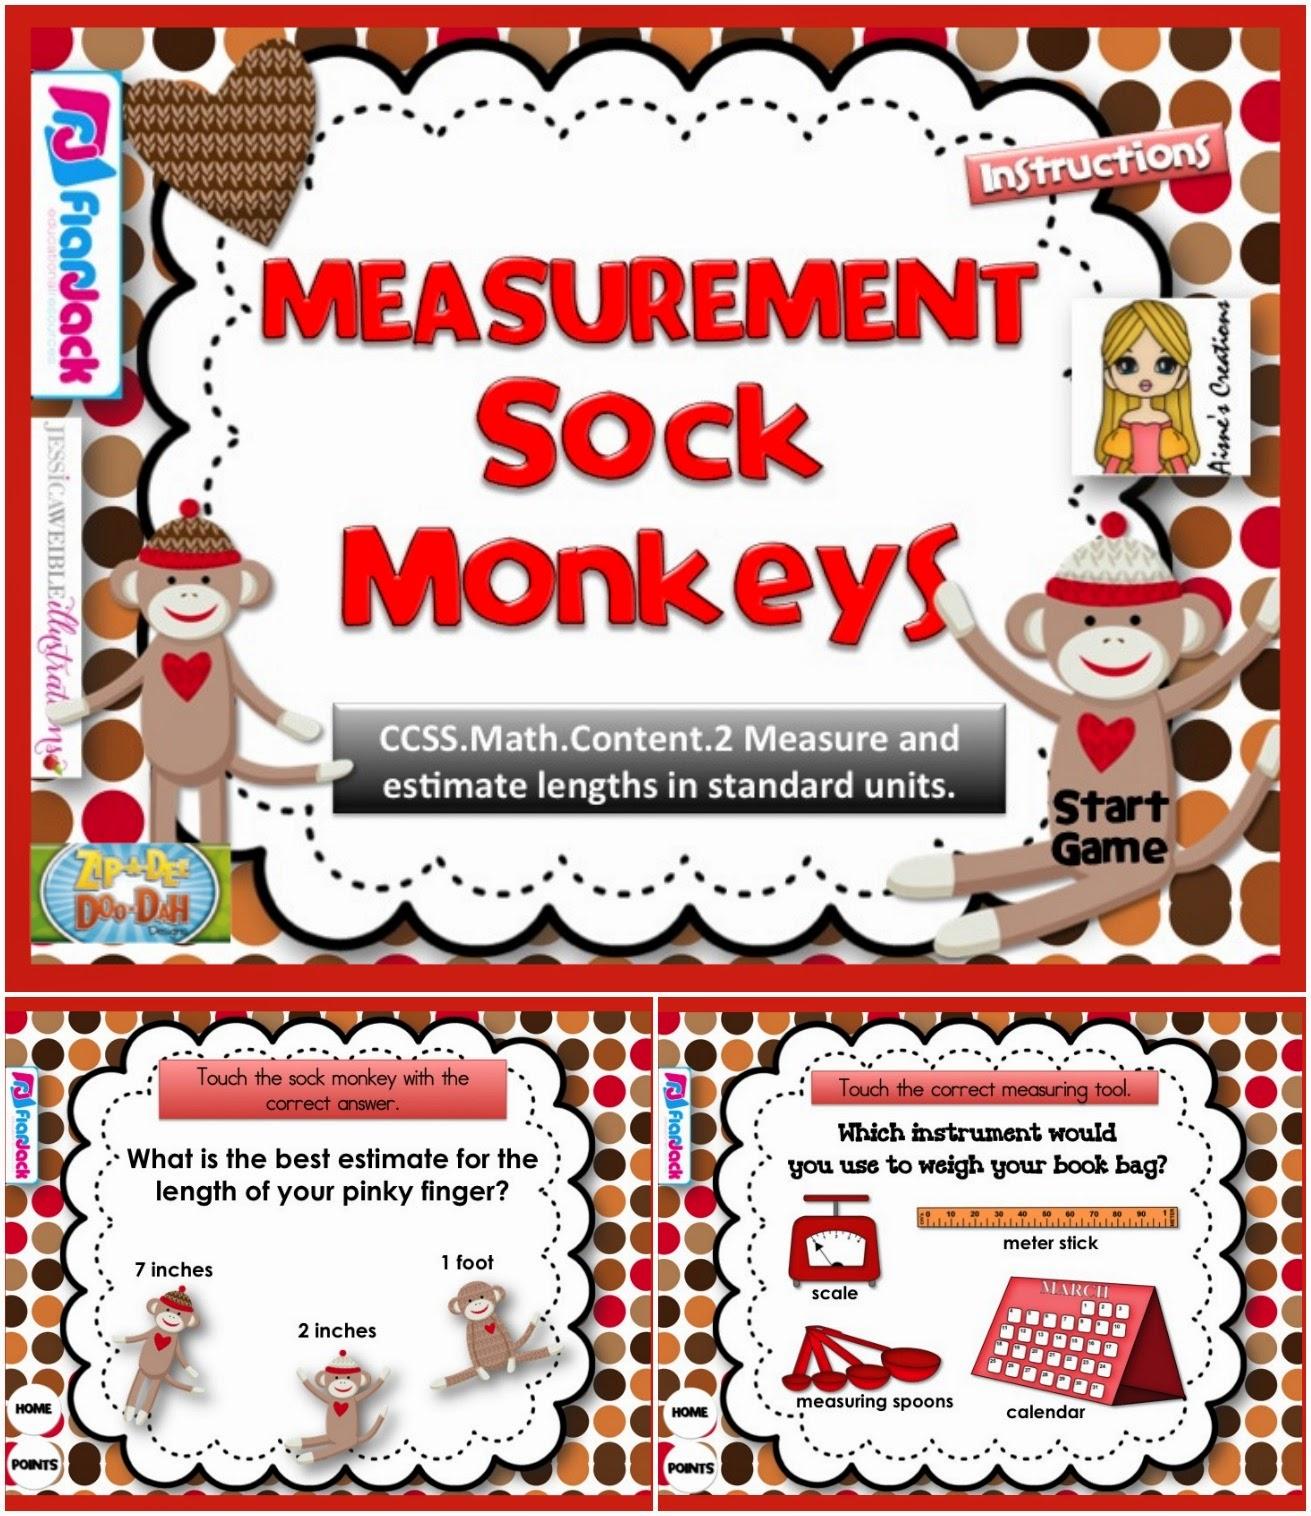 http://www.teacherspayteachers.com/Product/Measurement-Sock-Monkeys-Smart-Board-Game-CCSS2NBTMD2-1232791